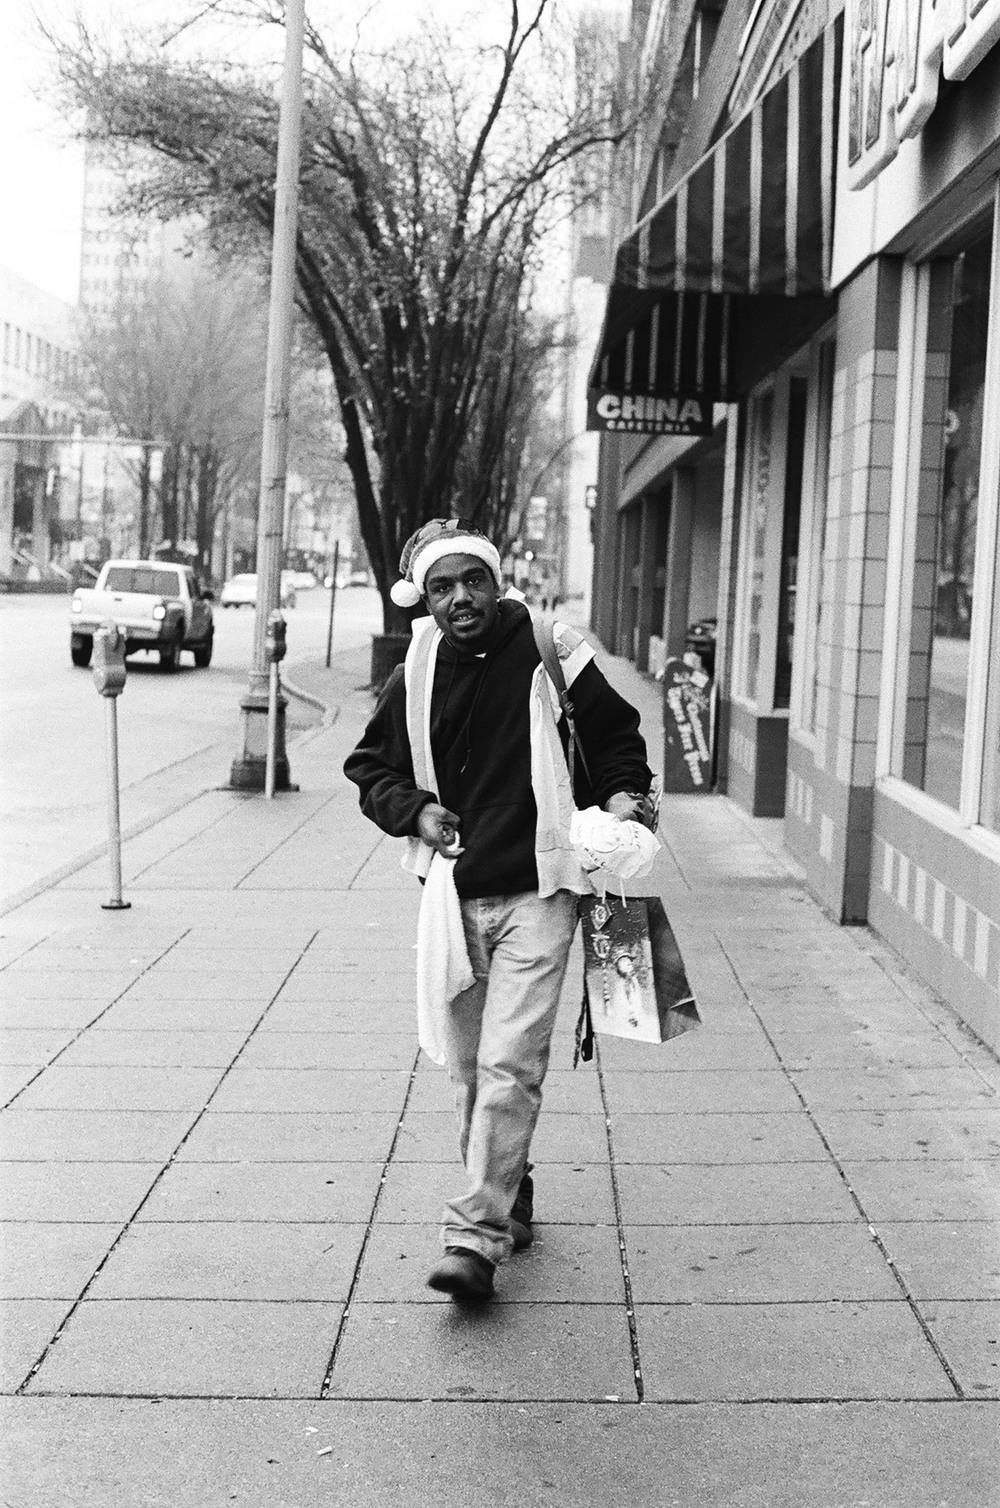 Chattanooga-Downtown-04.jpg